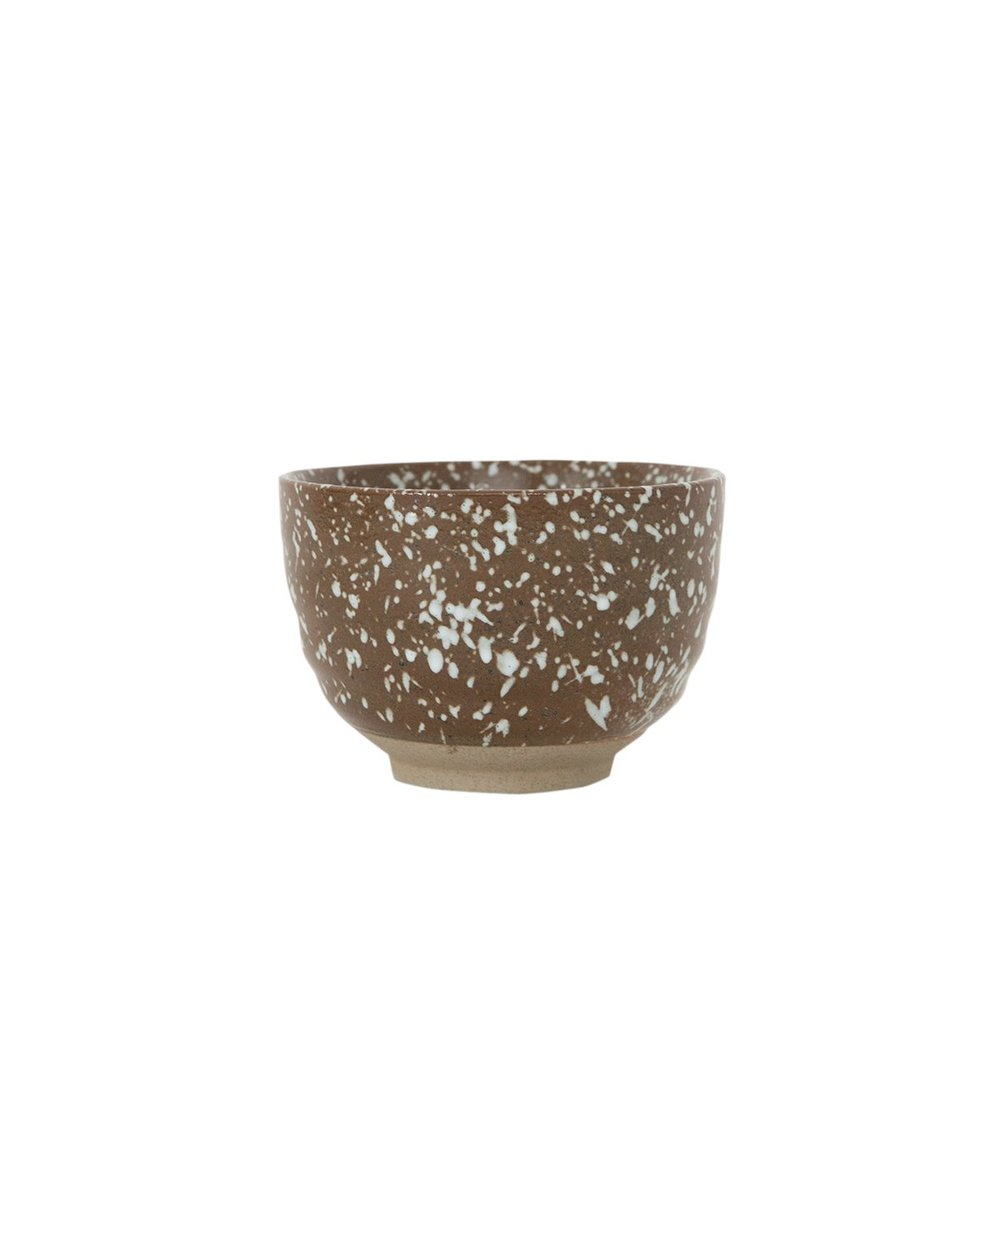 Speckled_Bowl2.jpg